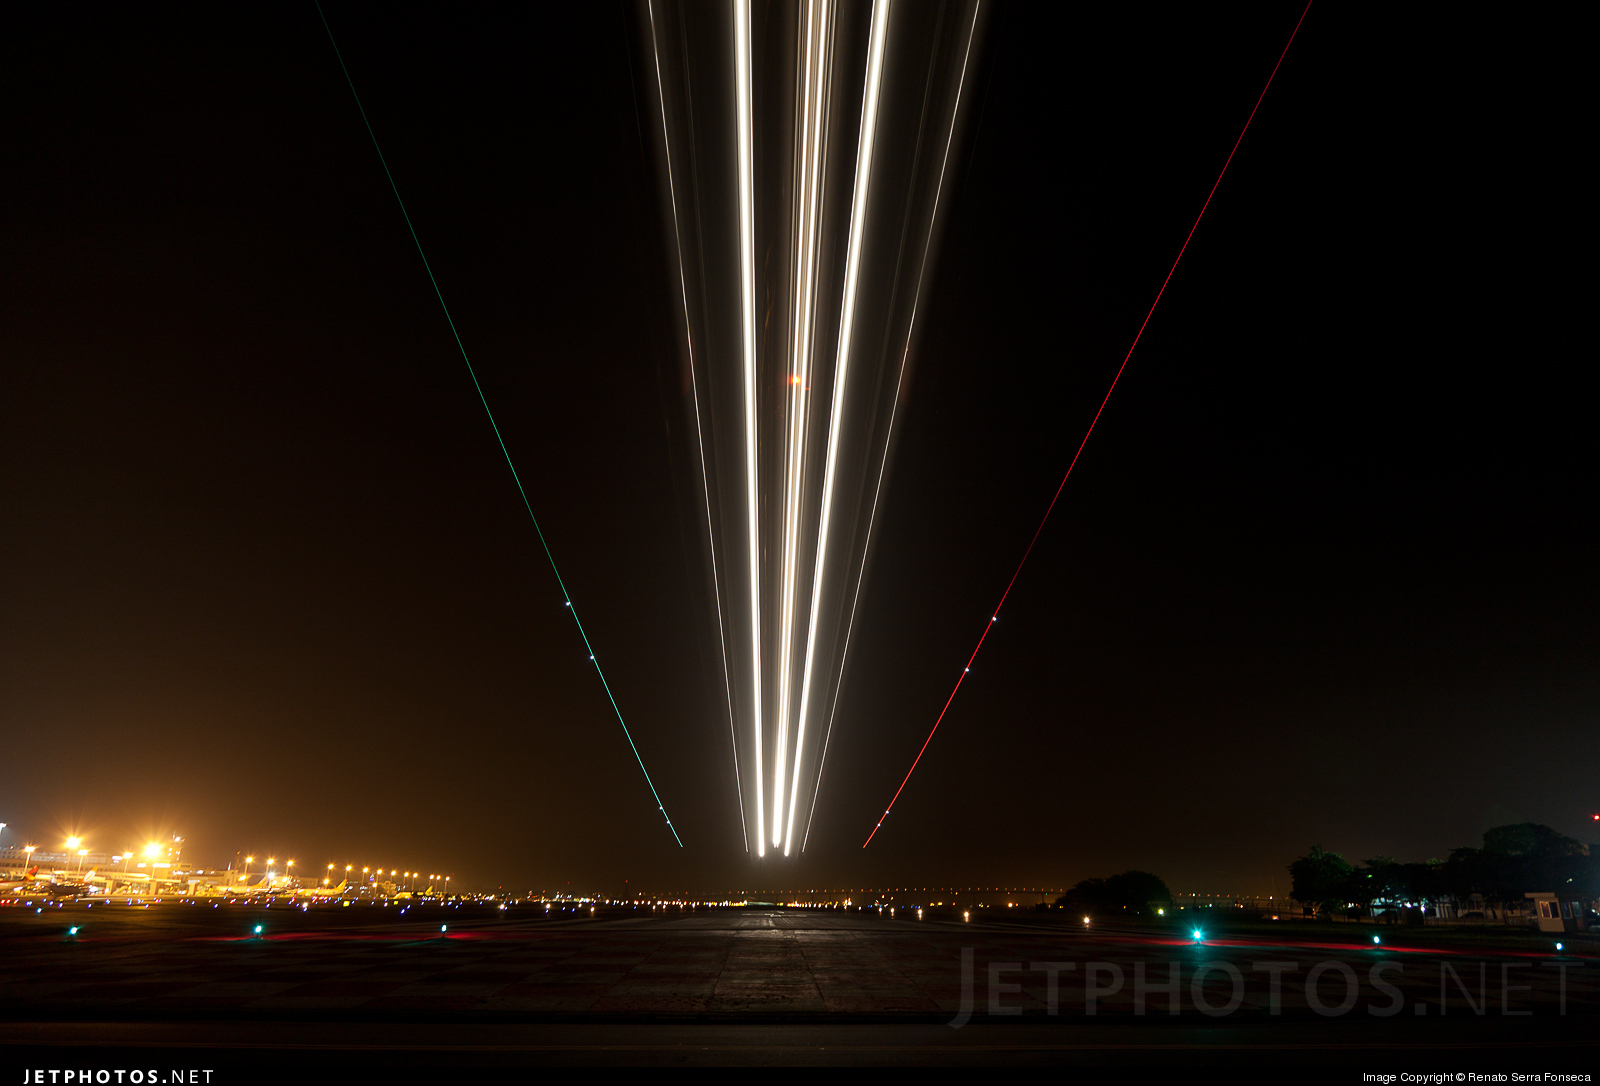 SBRJ - Airport - Runway